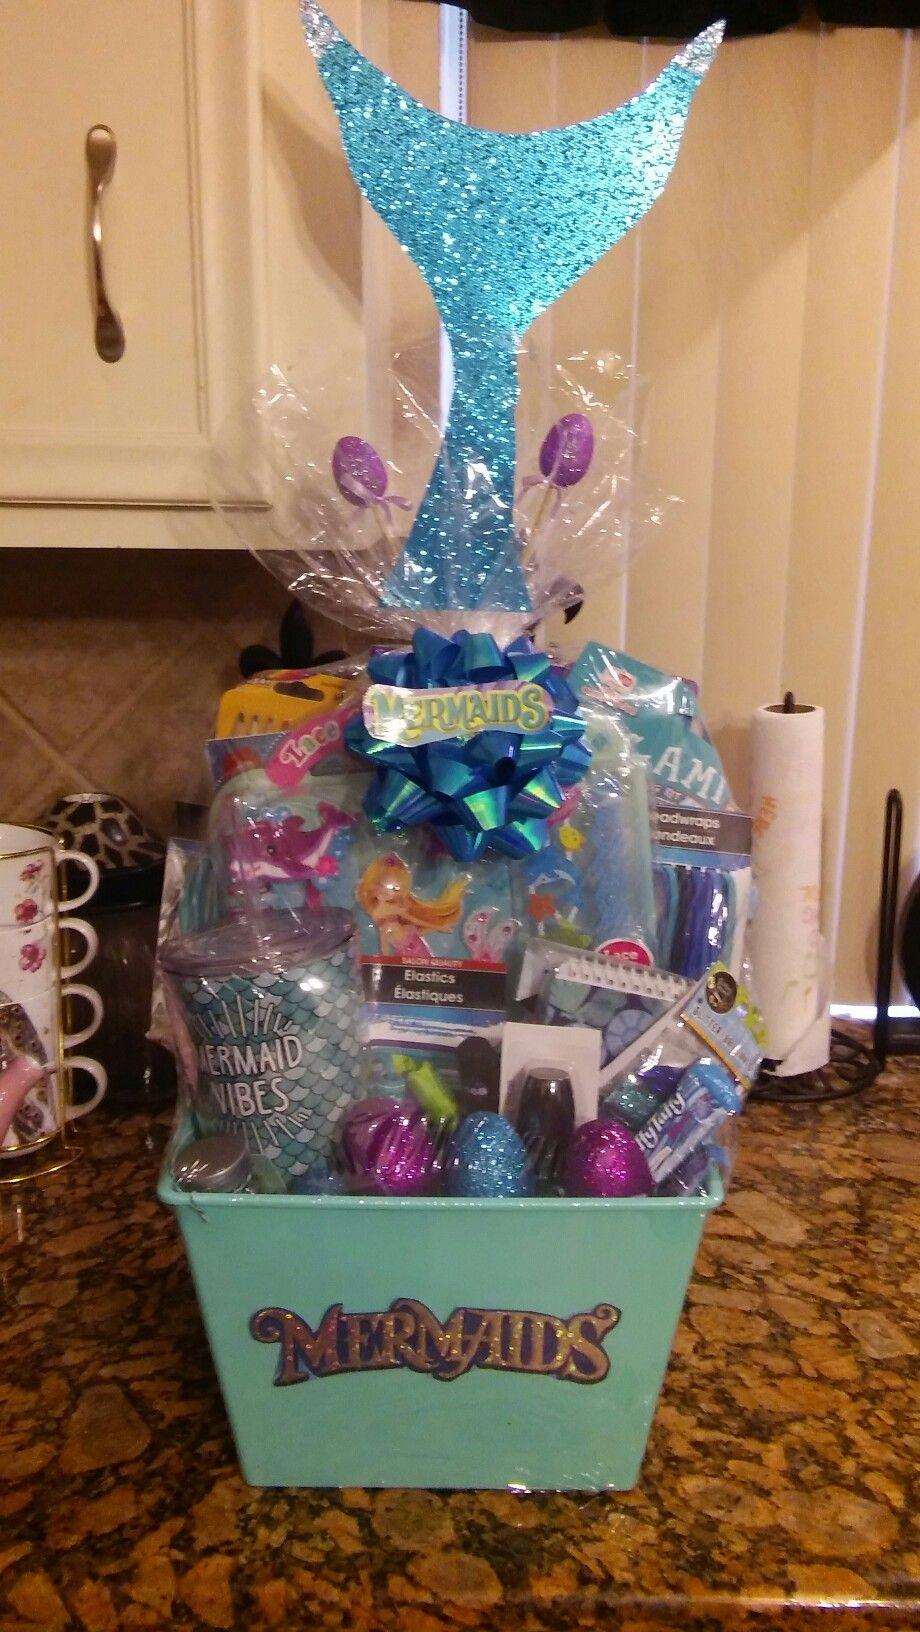 Mermaid easter basket gift baskets pinterest easter baskets mermaid easter basket negle Choice Image